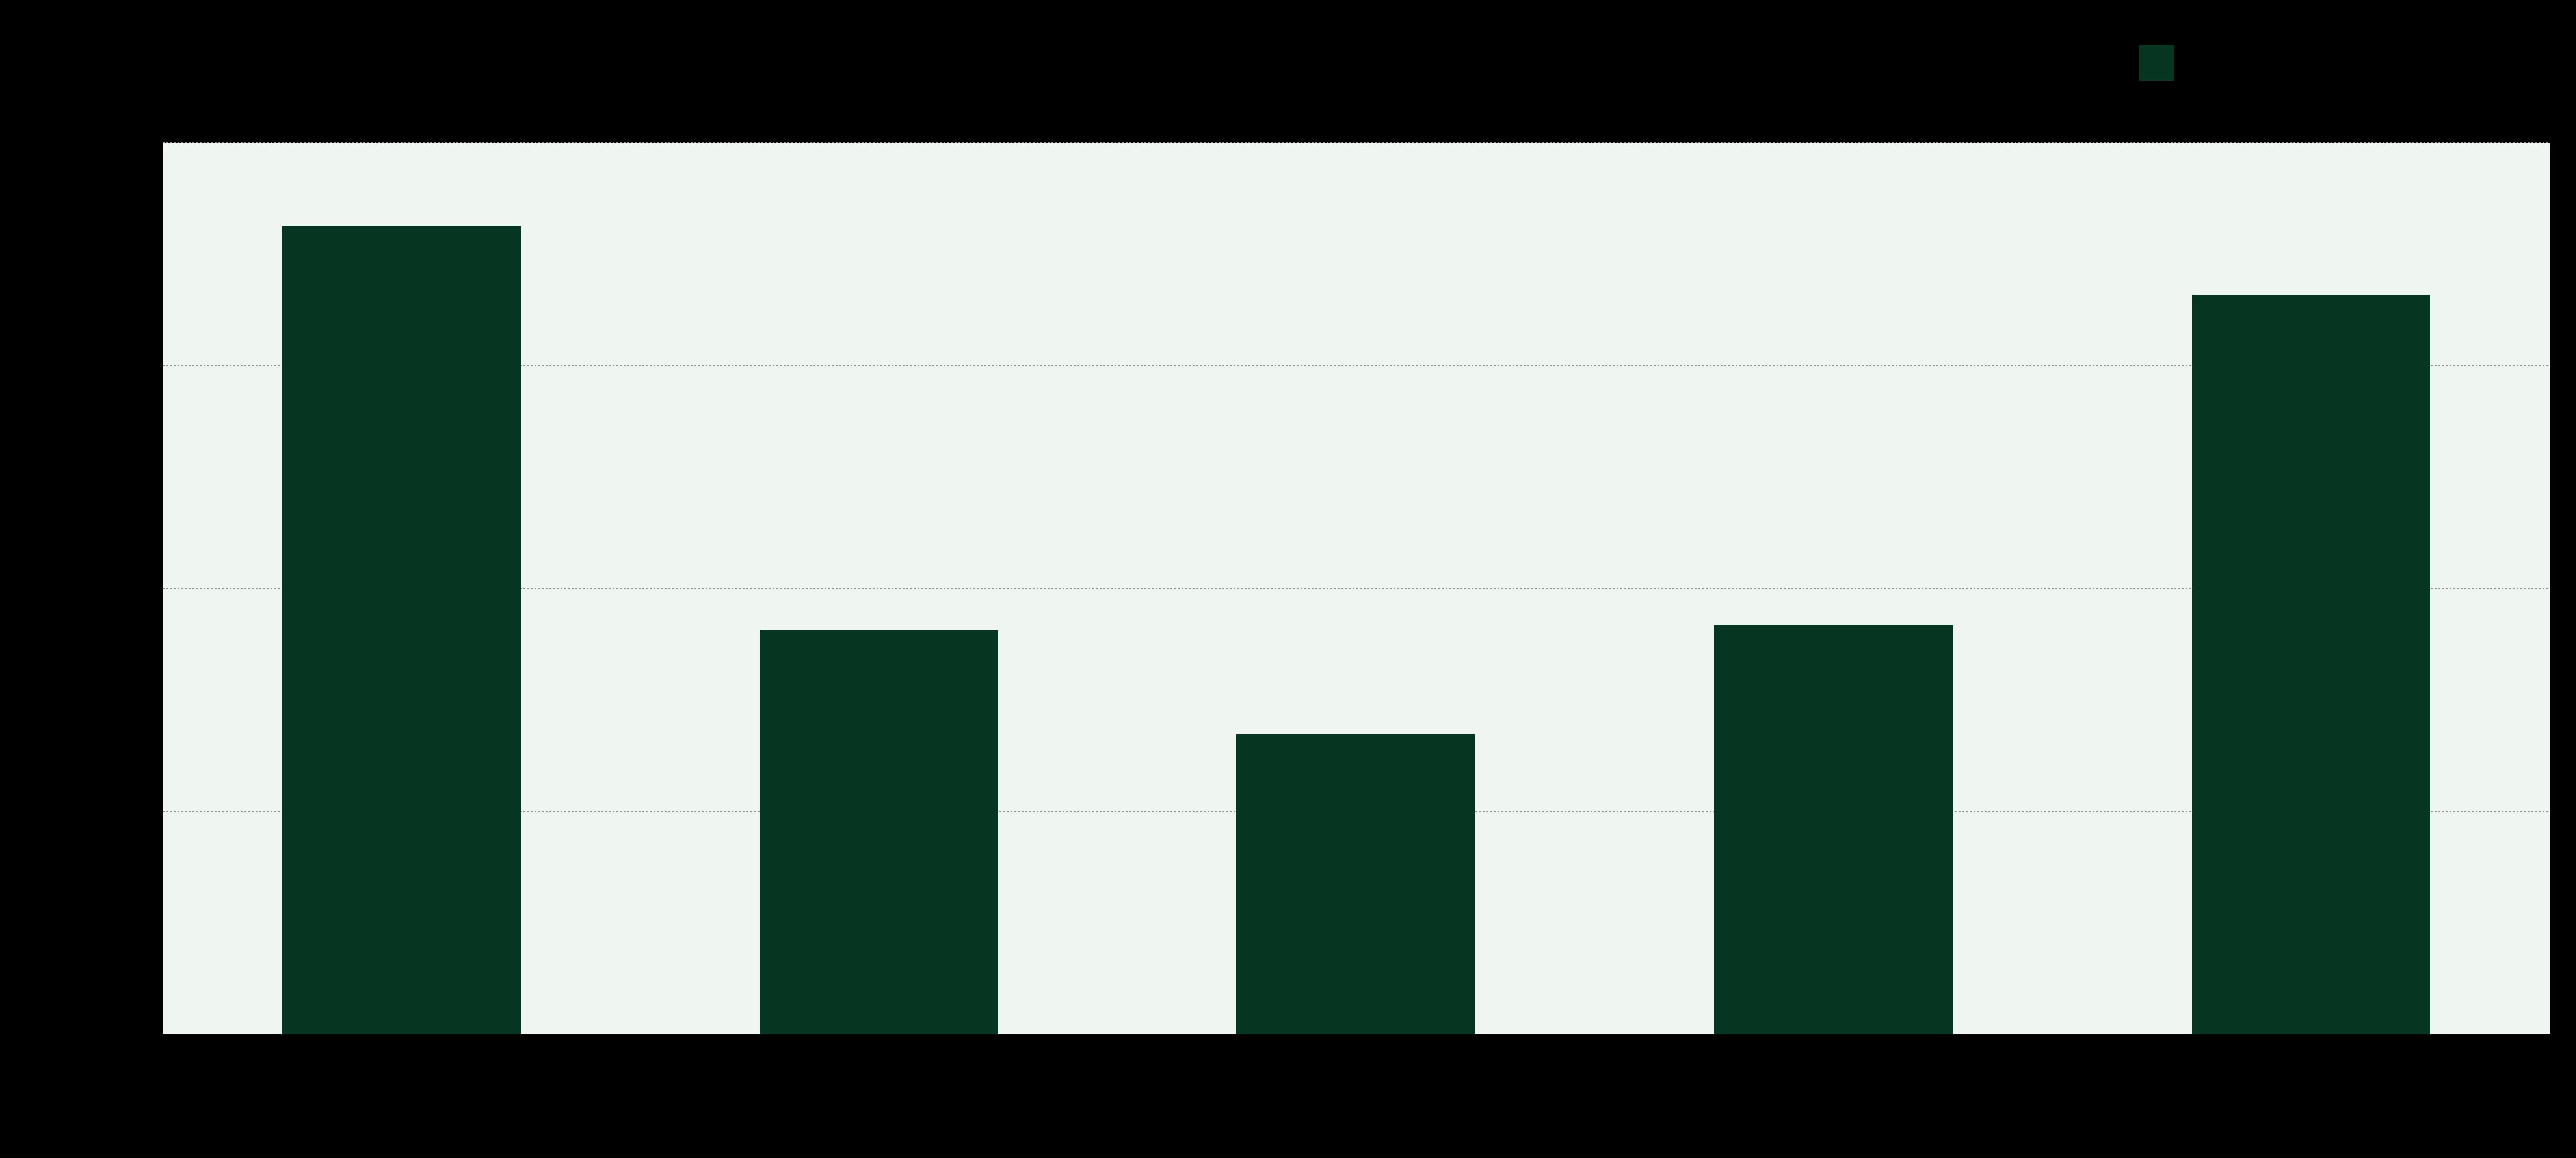 Webinar attendance rate per weekday